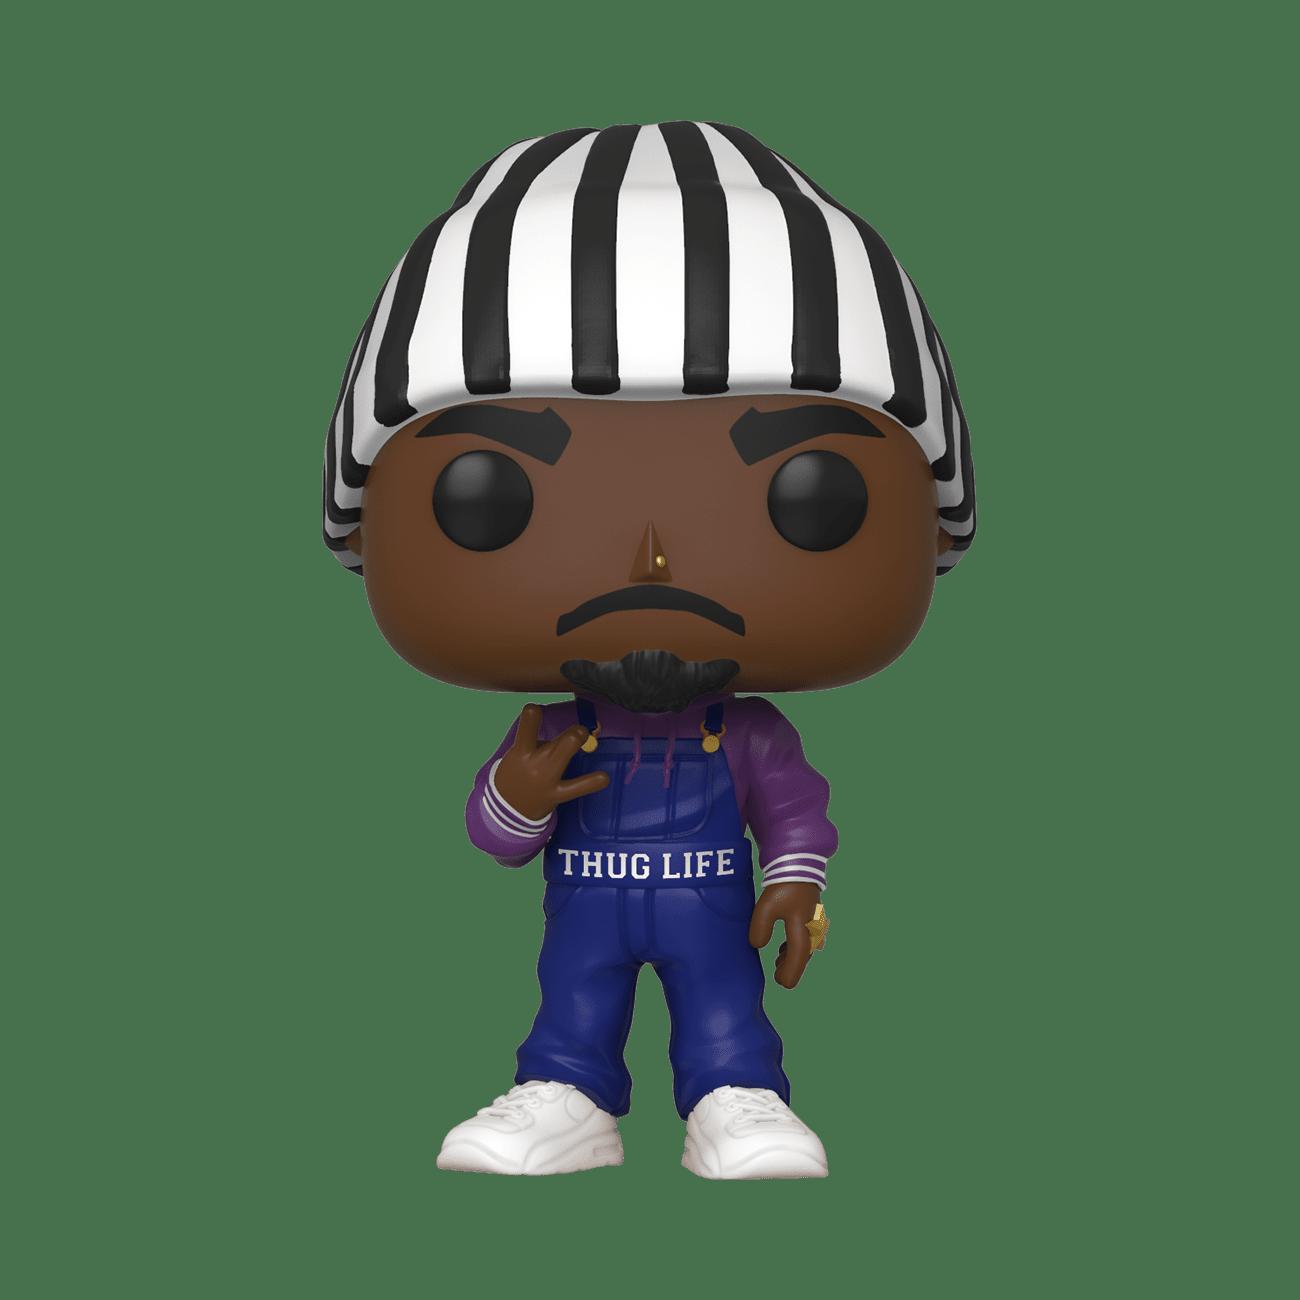 Funko Tupac Shakur in Thug Life Overalls Pop! Vinyl Figure